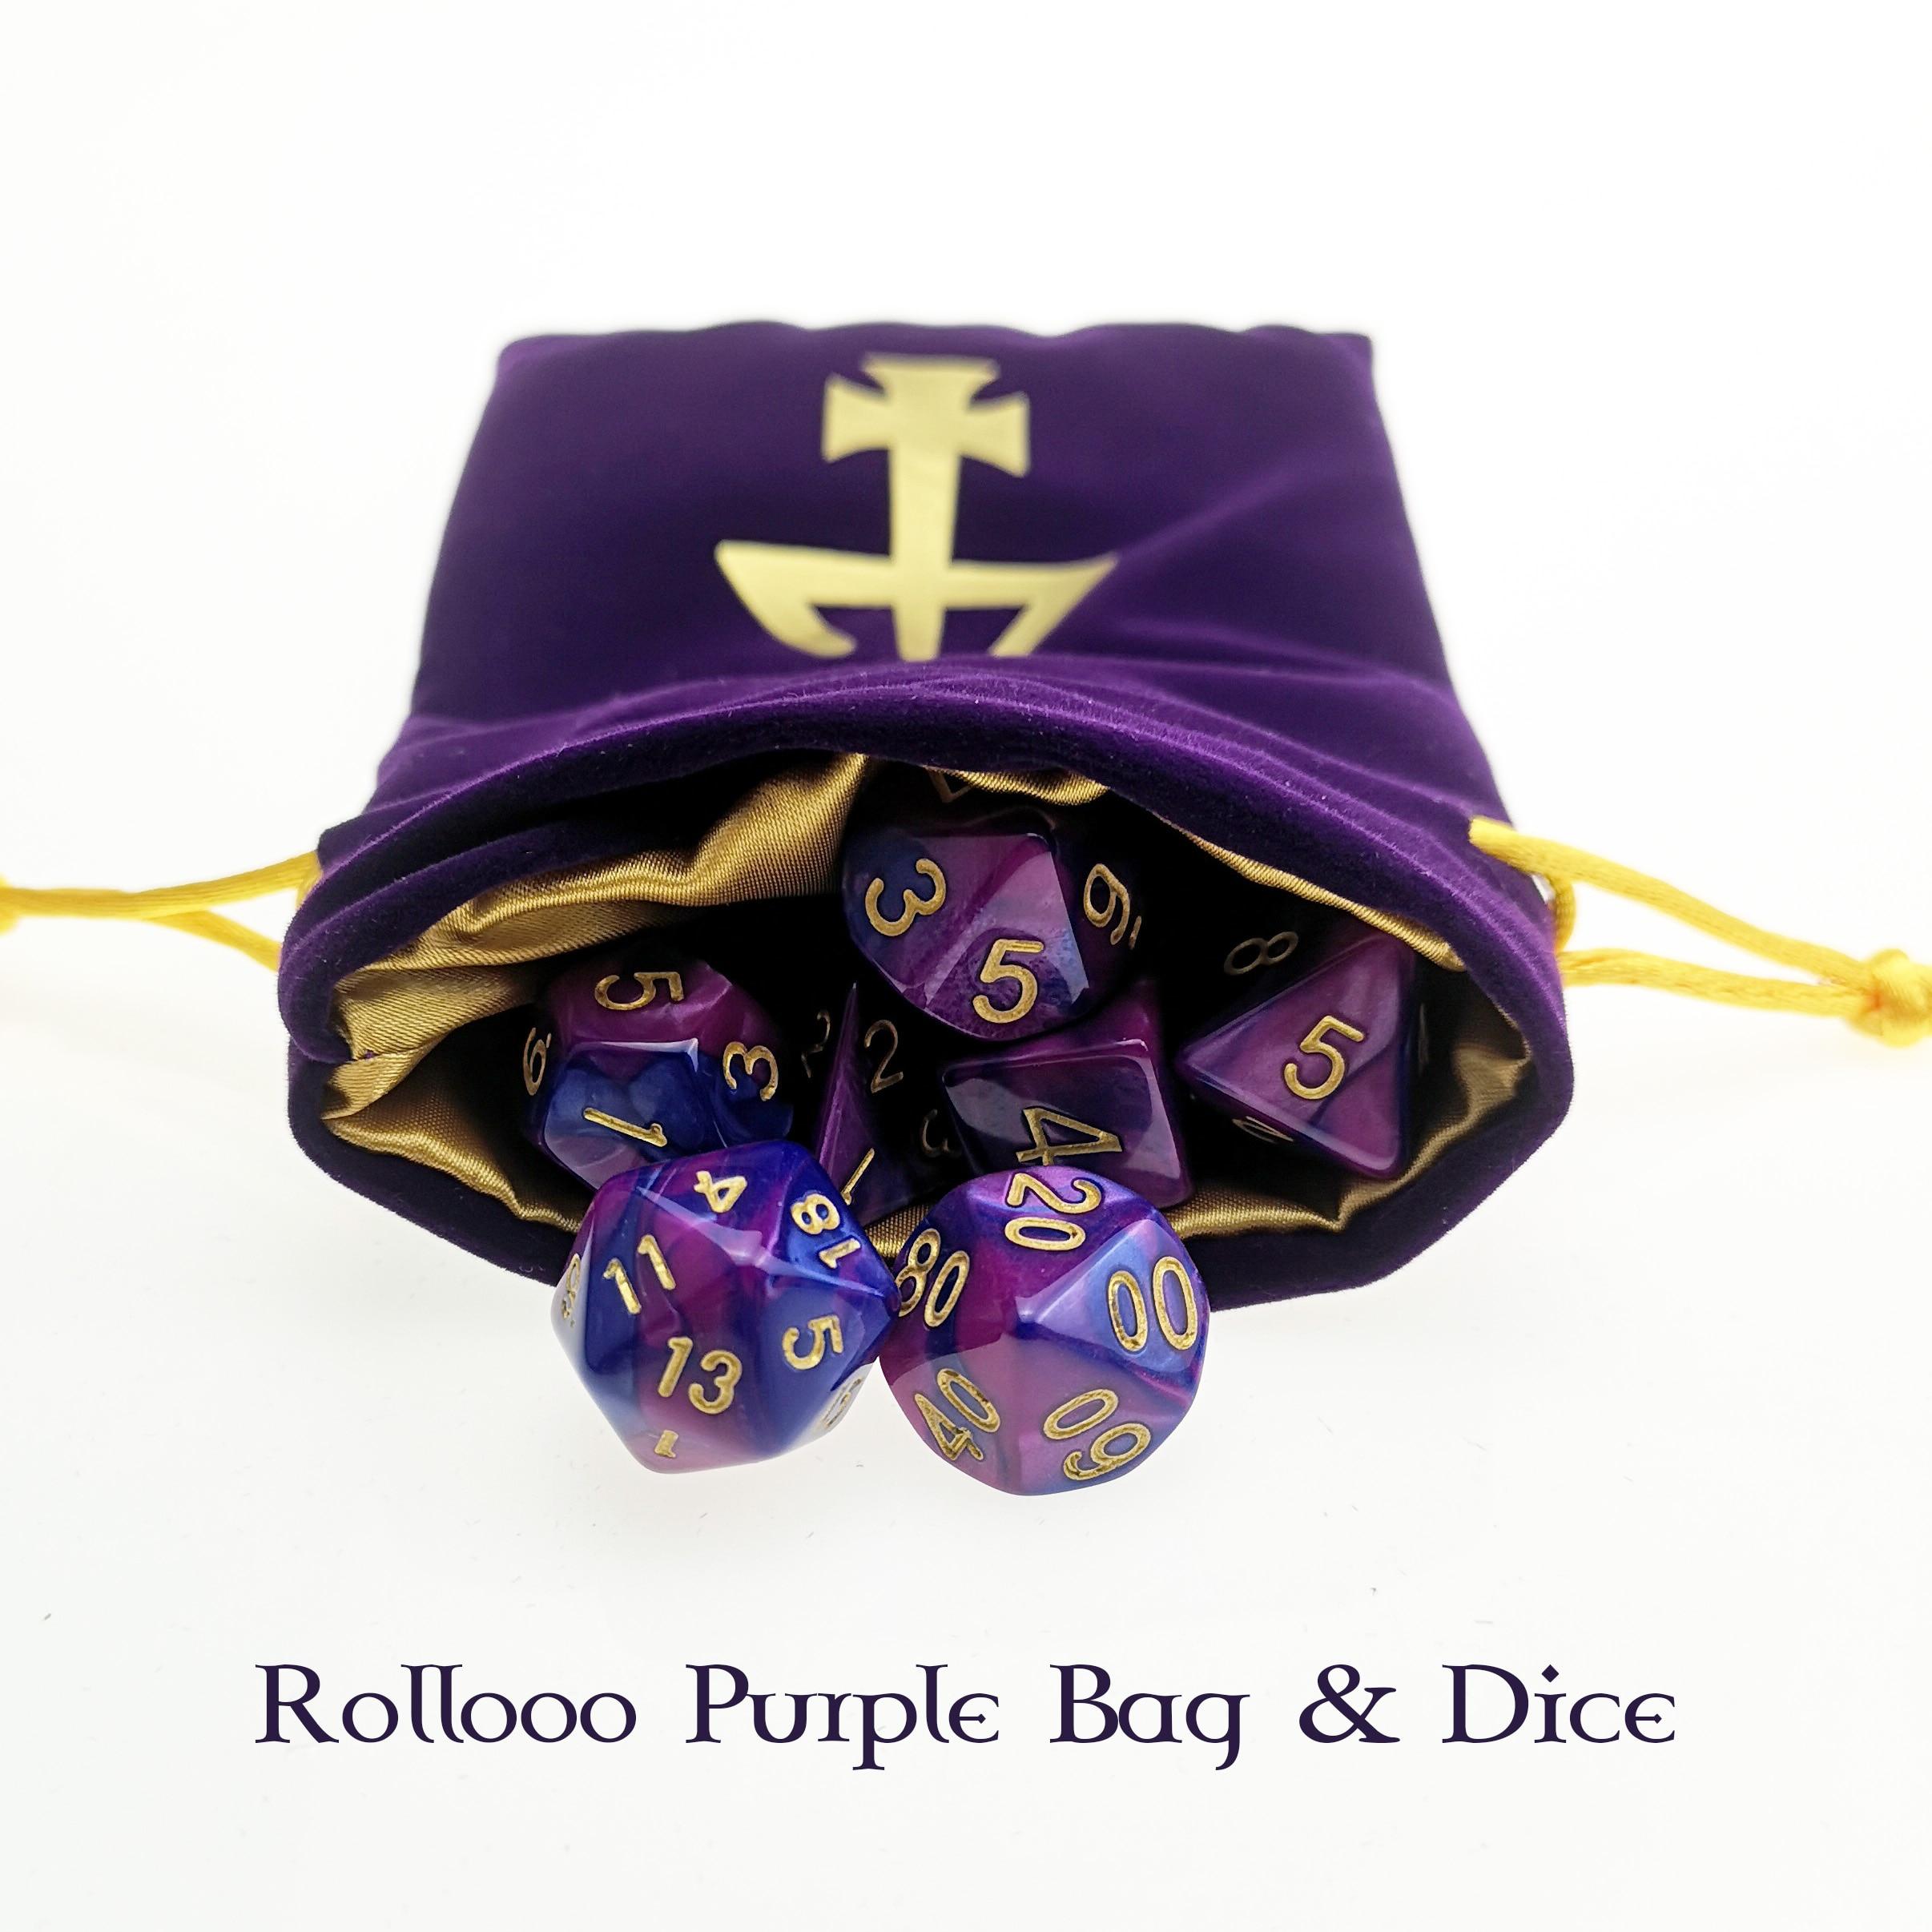 Rollooo Purple Bag & Dice Set With Customized Logo